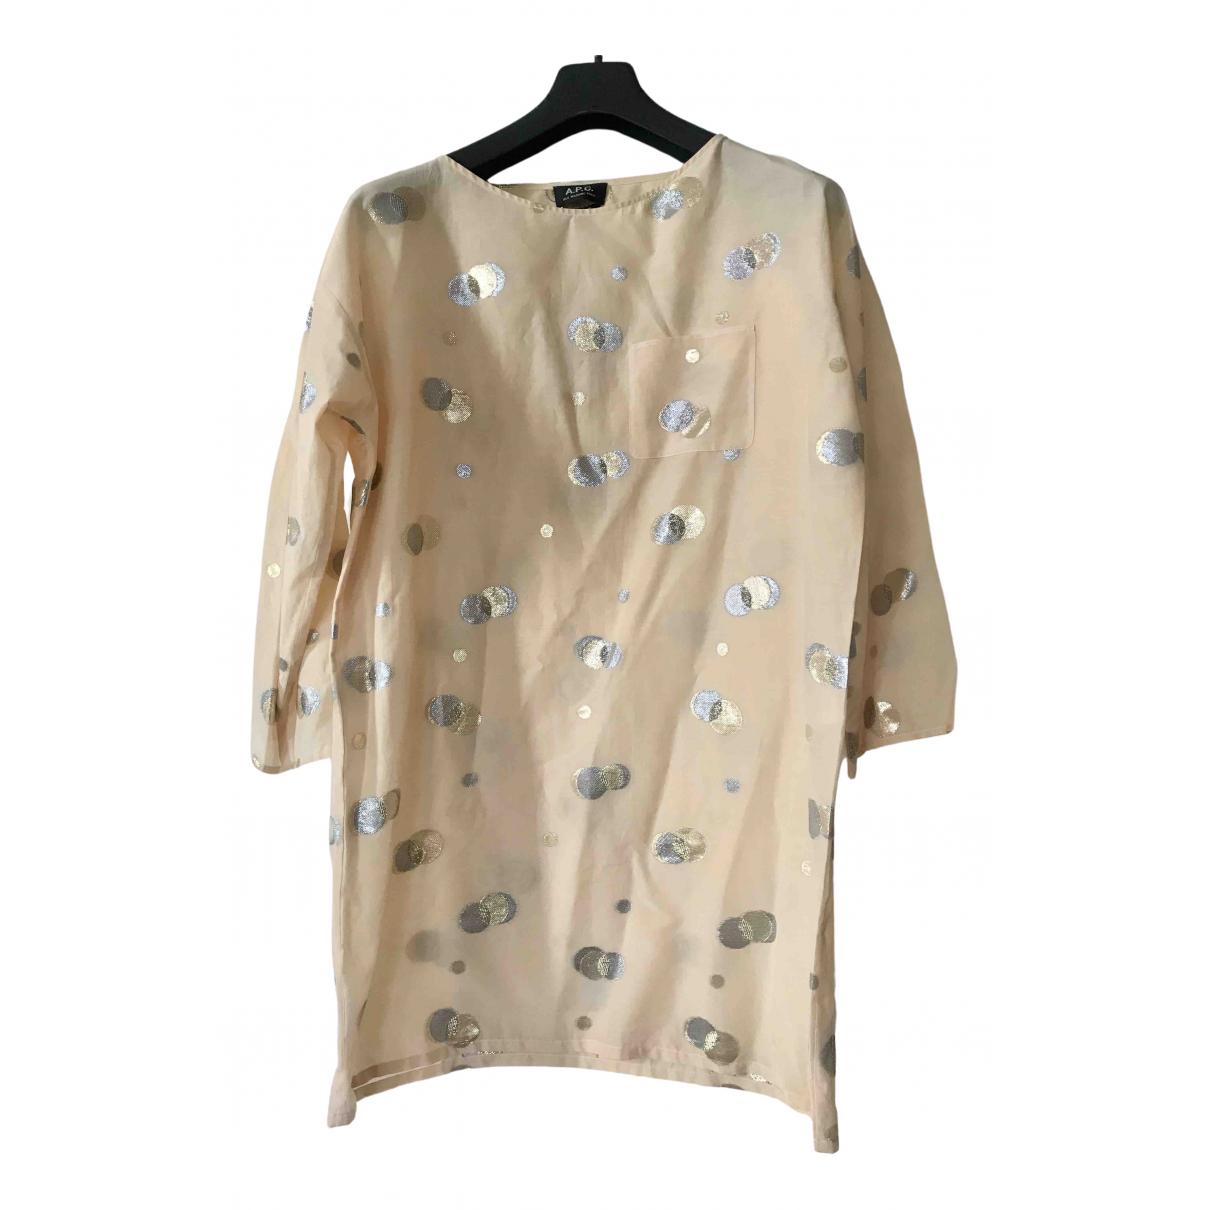 Apc \N Beige Cotton dress for Women 38 FR